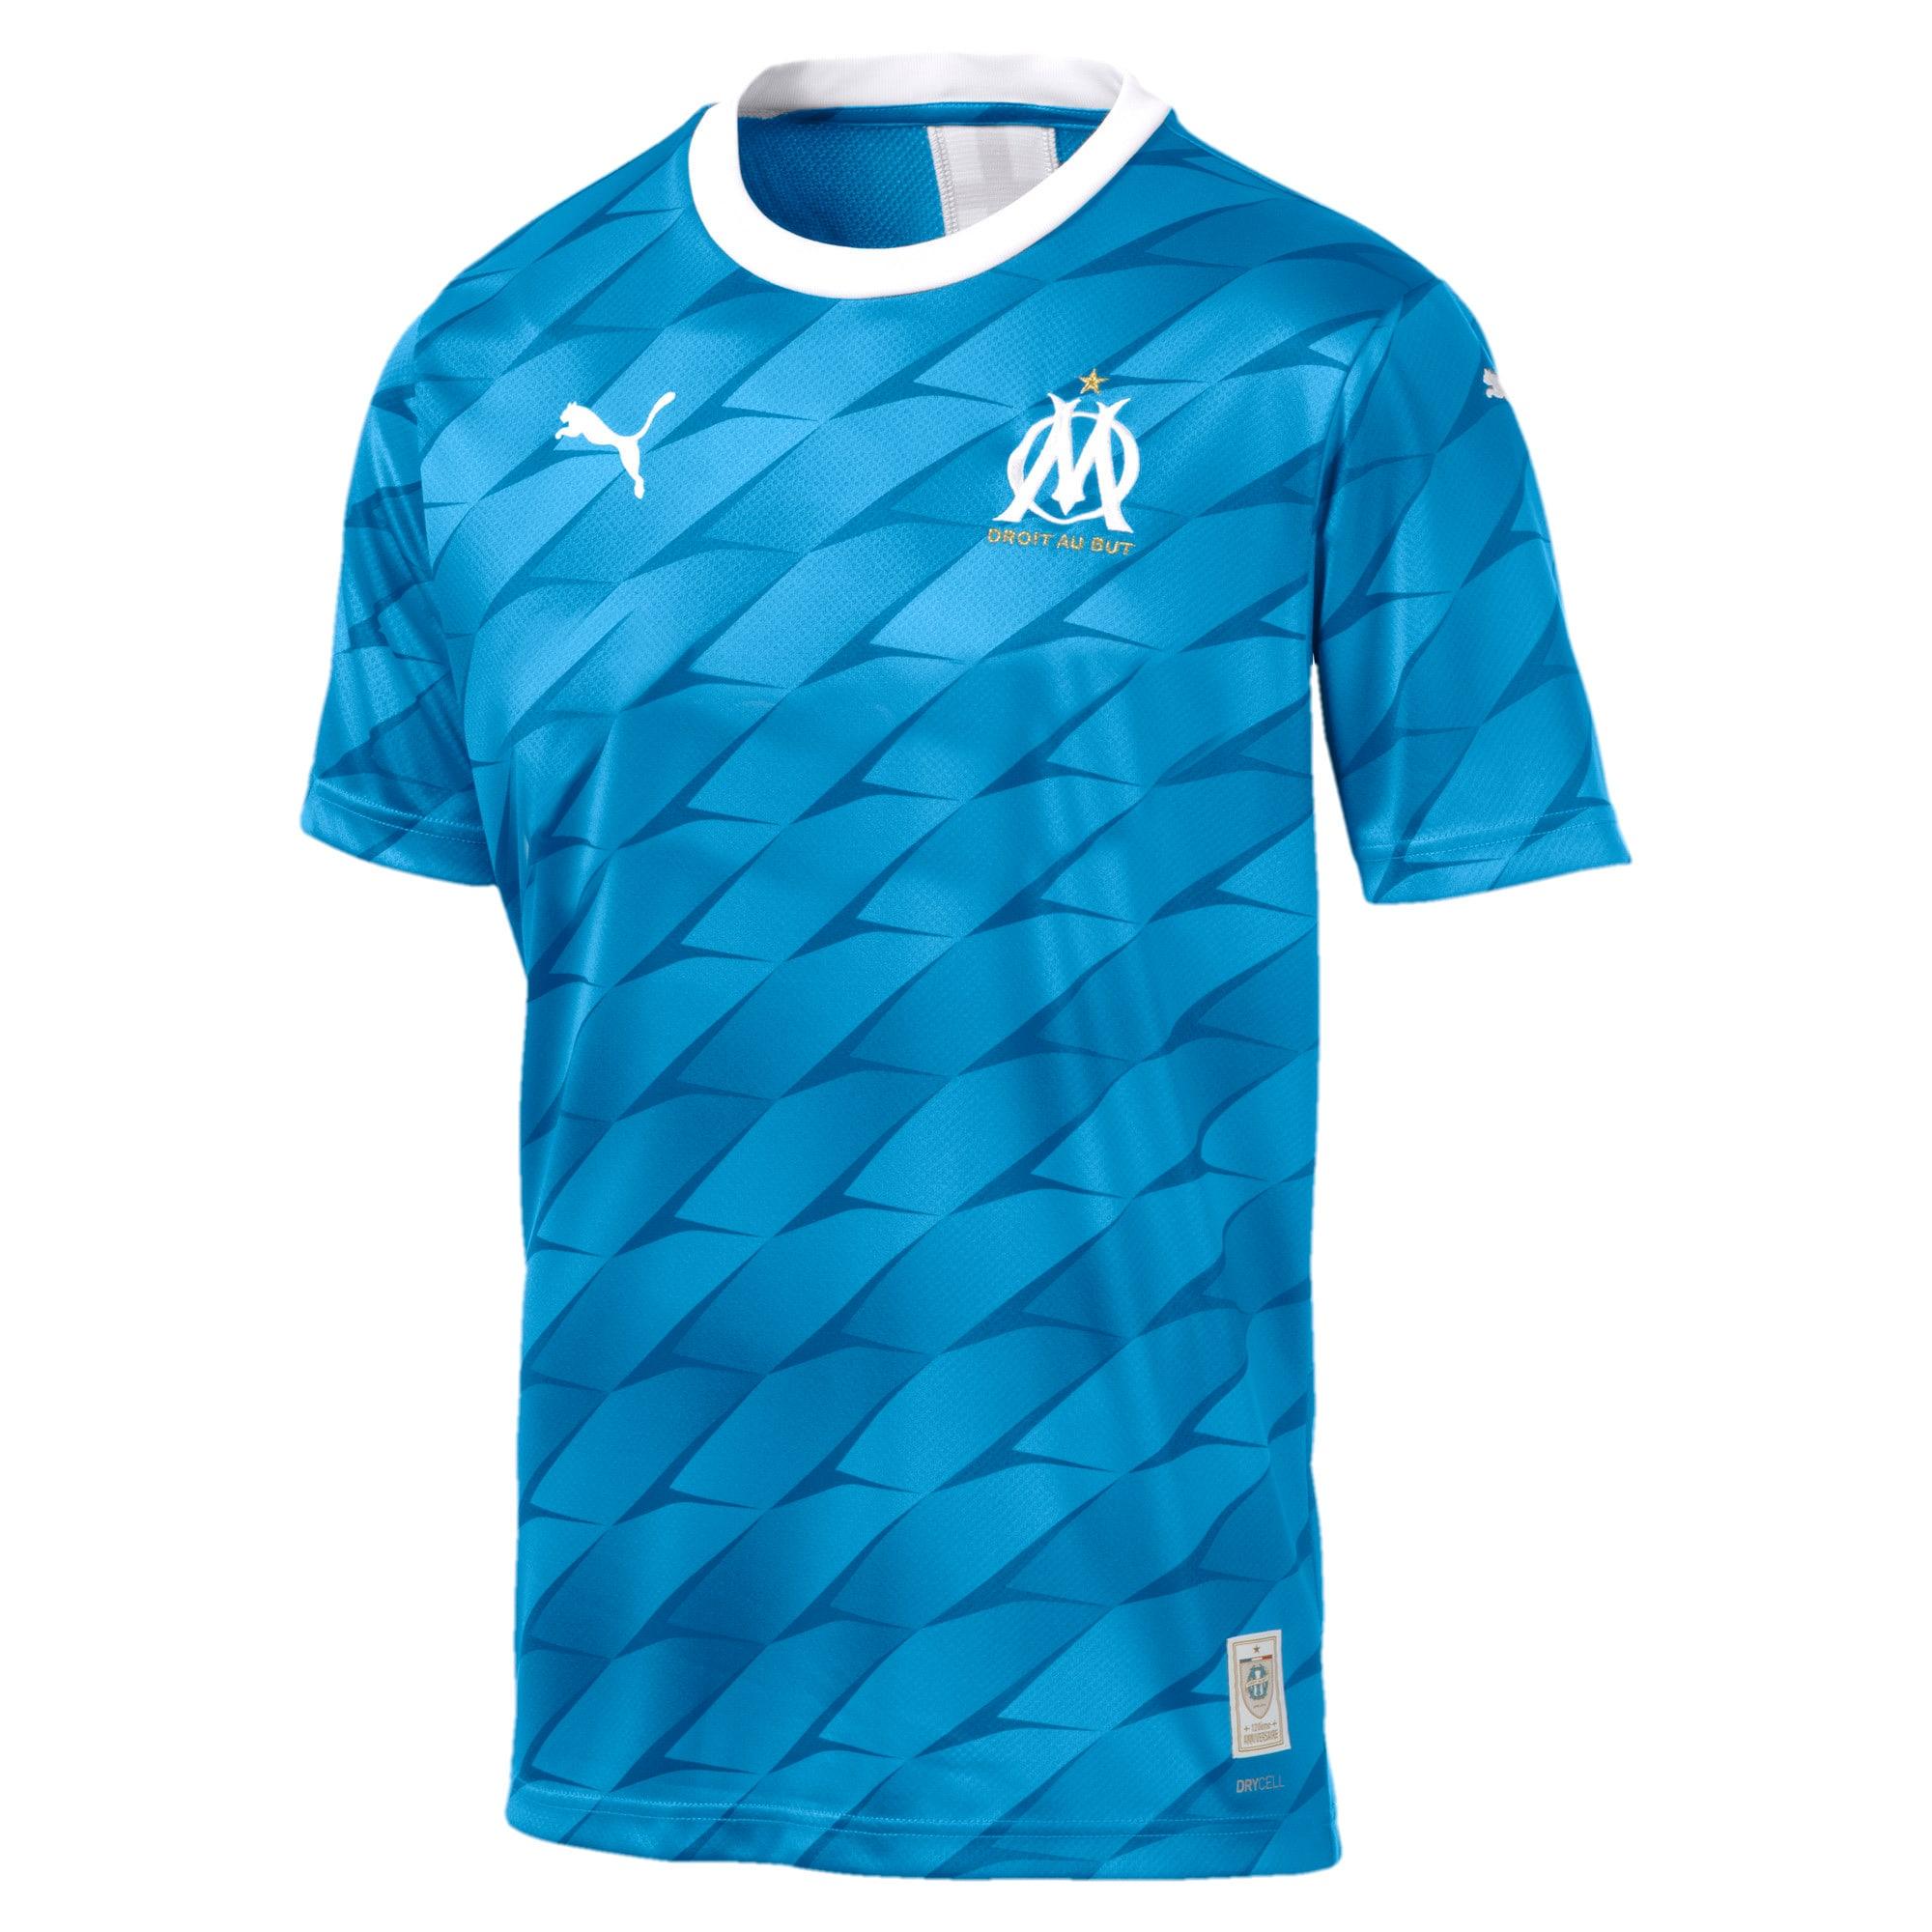 Miniatura 1 de Réplica de la camiseta de visitante delOlympique de Marseillepara hombre, Bleu Azur-Puma White, mediano